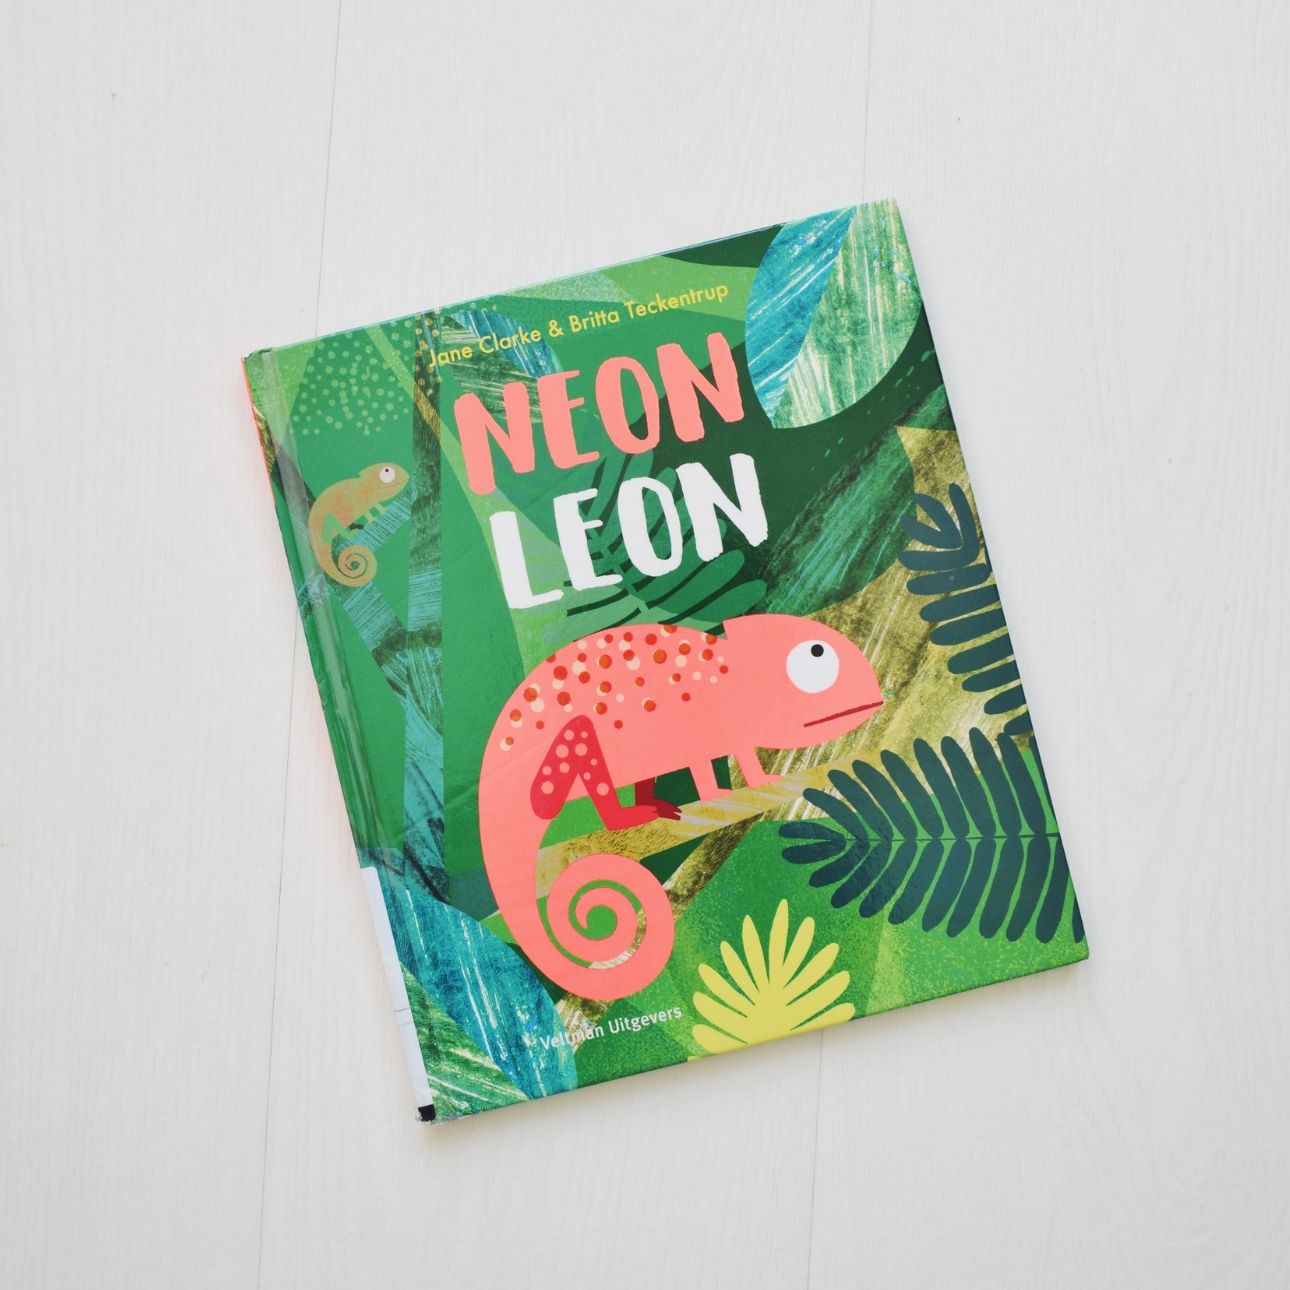 neon leon britta teckentrup